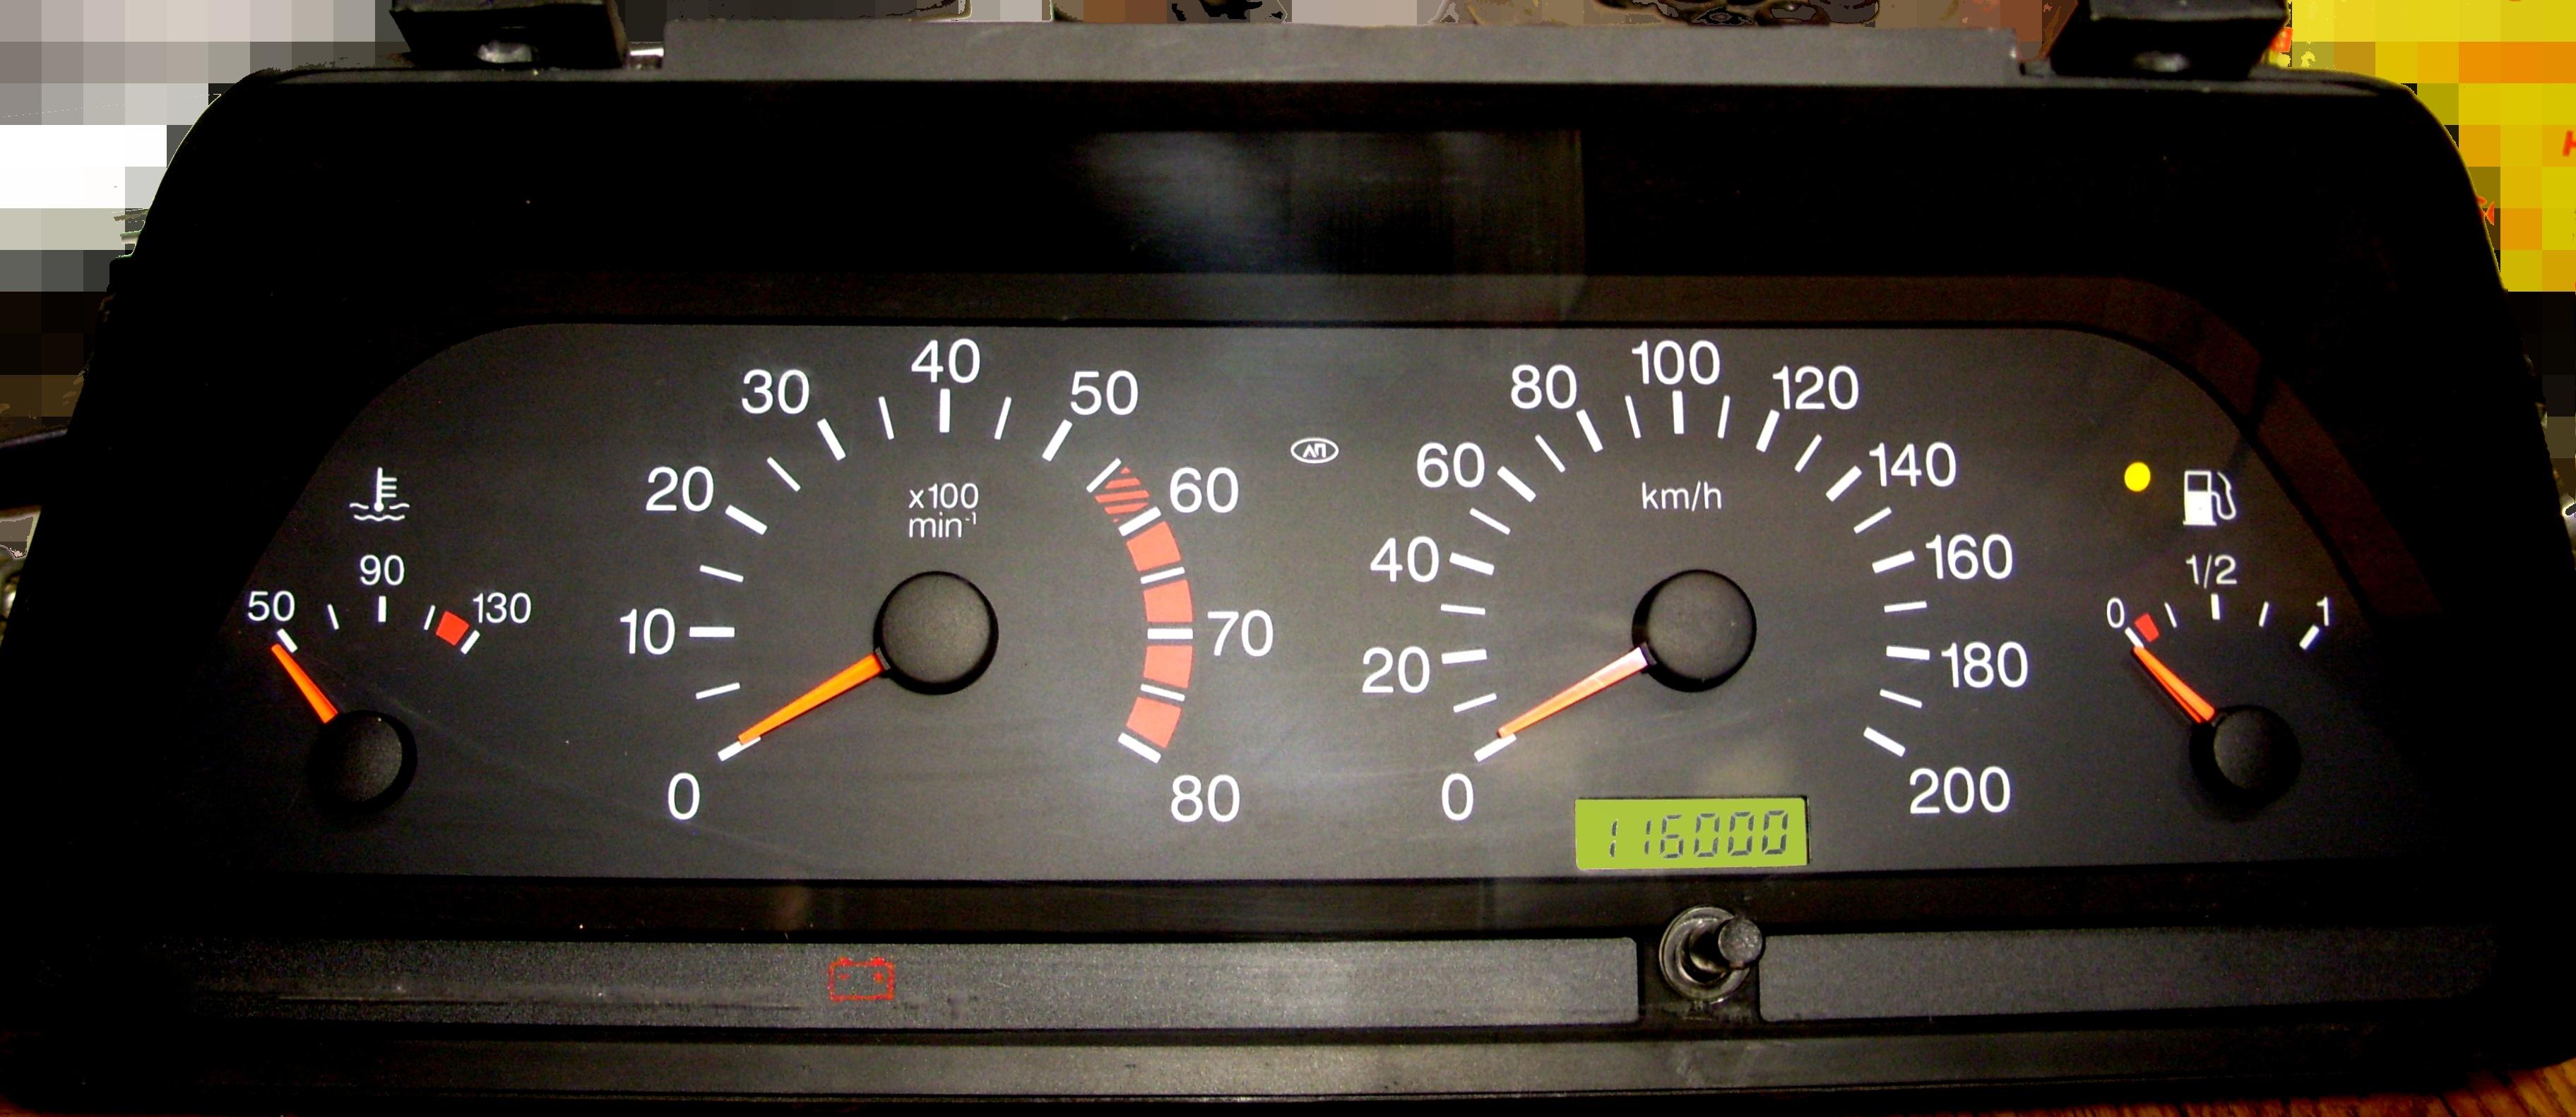 Фото №21 - ремонт спидометра ВАЗ 2110 своими руками